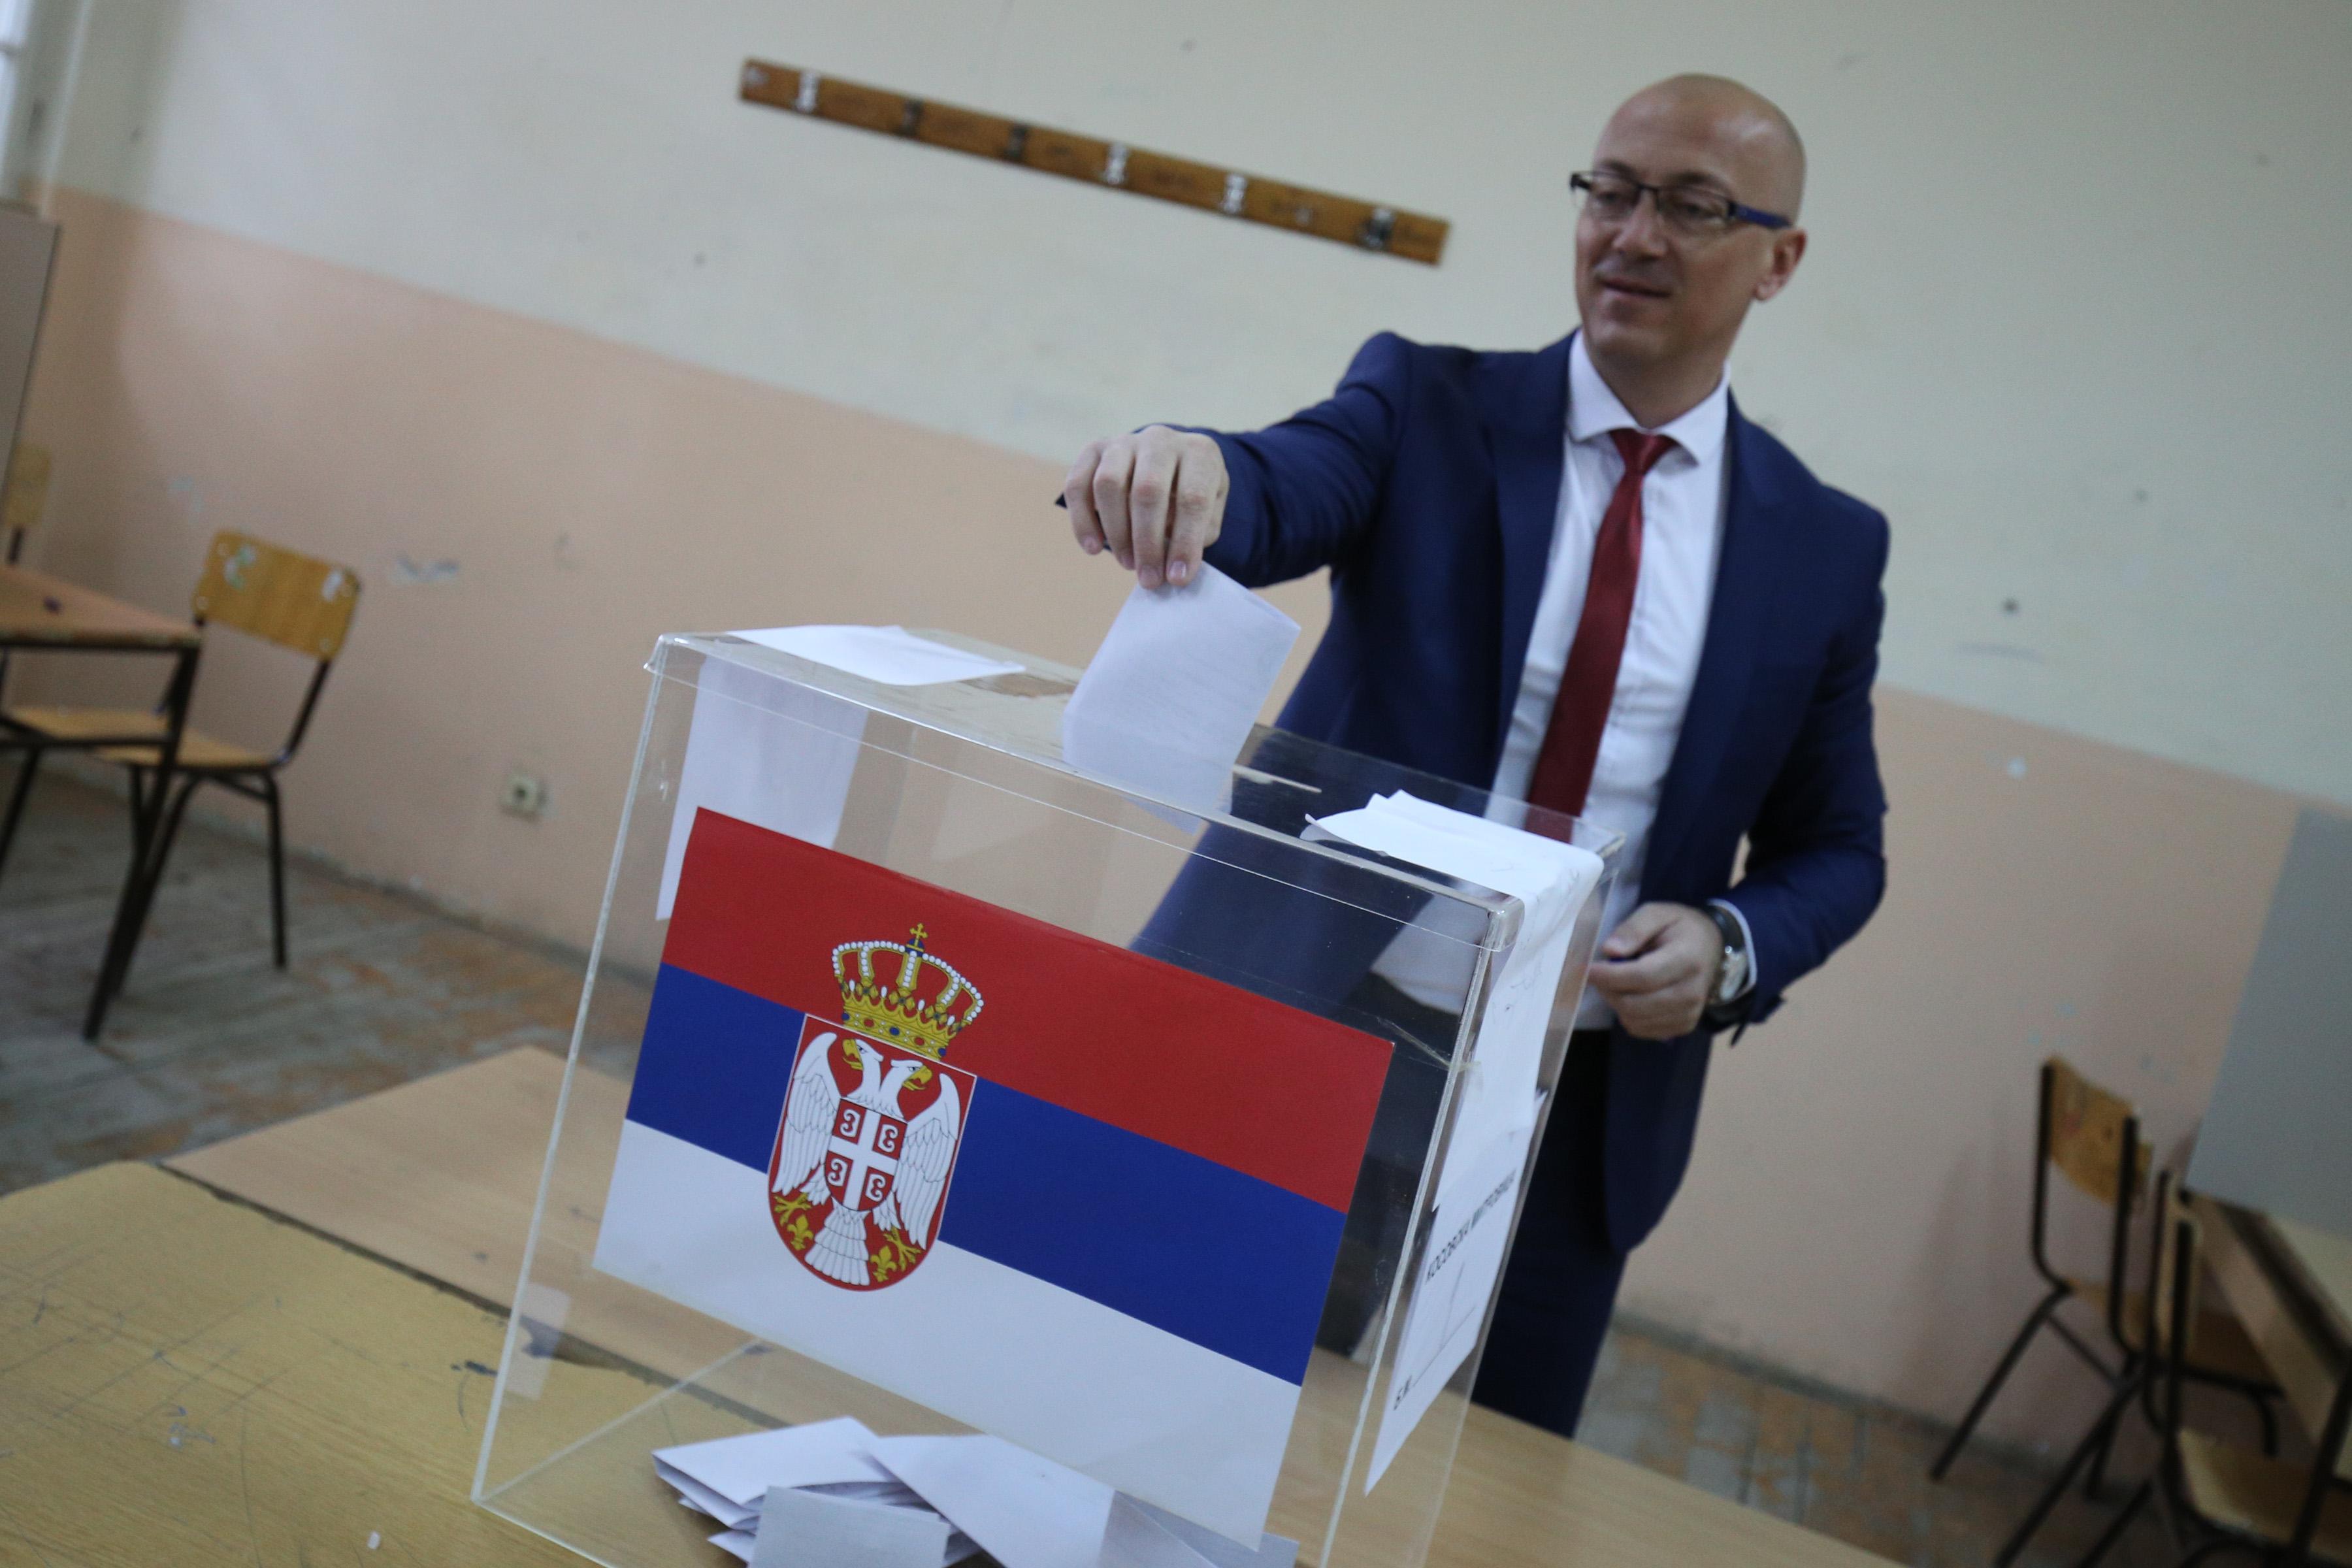 Goran Rakić FOTO TANJUG/ BOKI/ bk